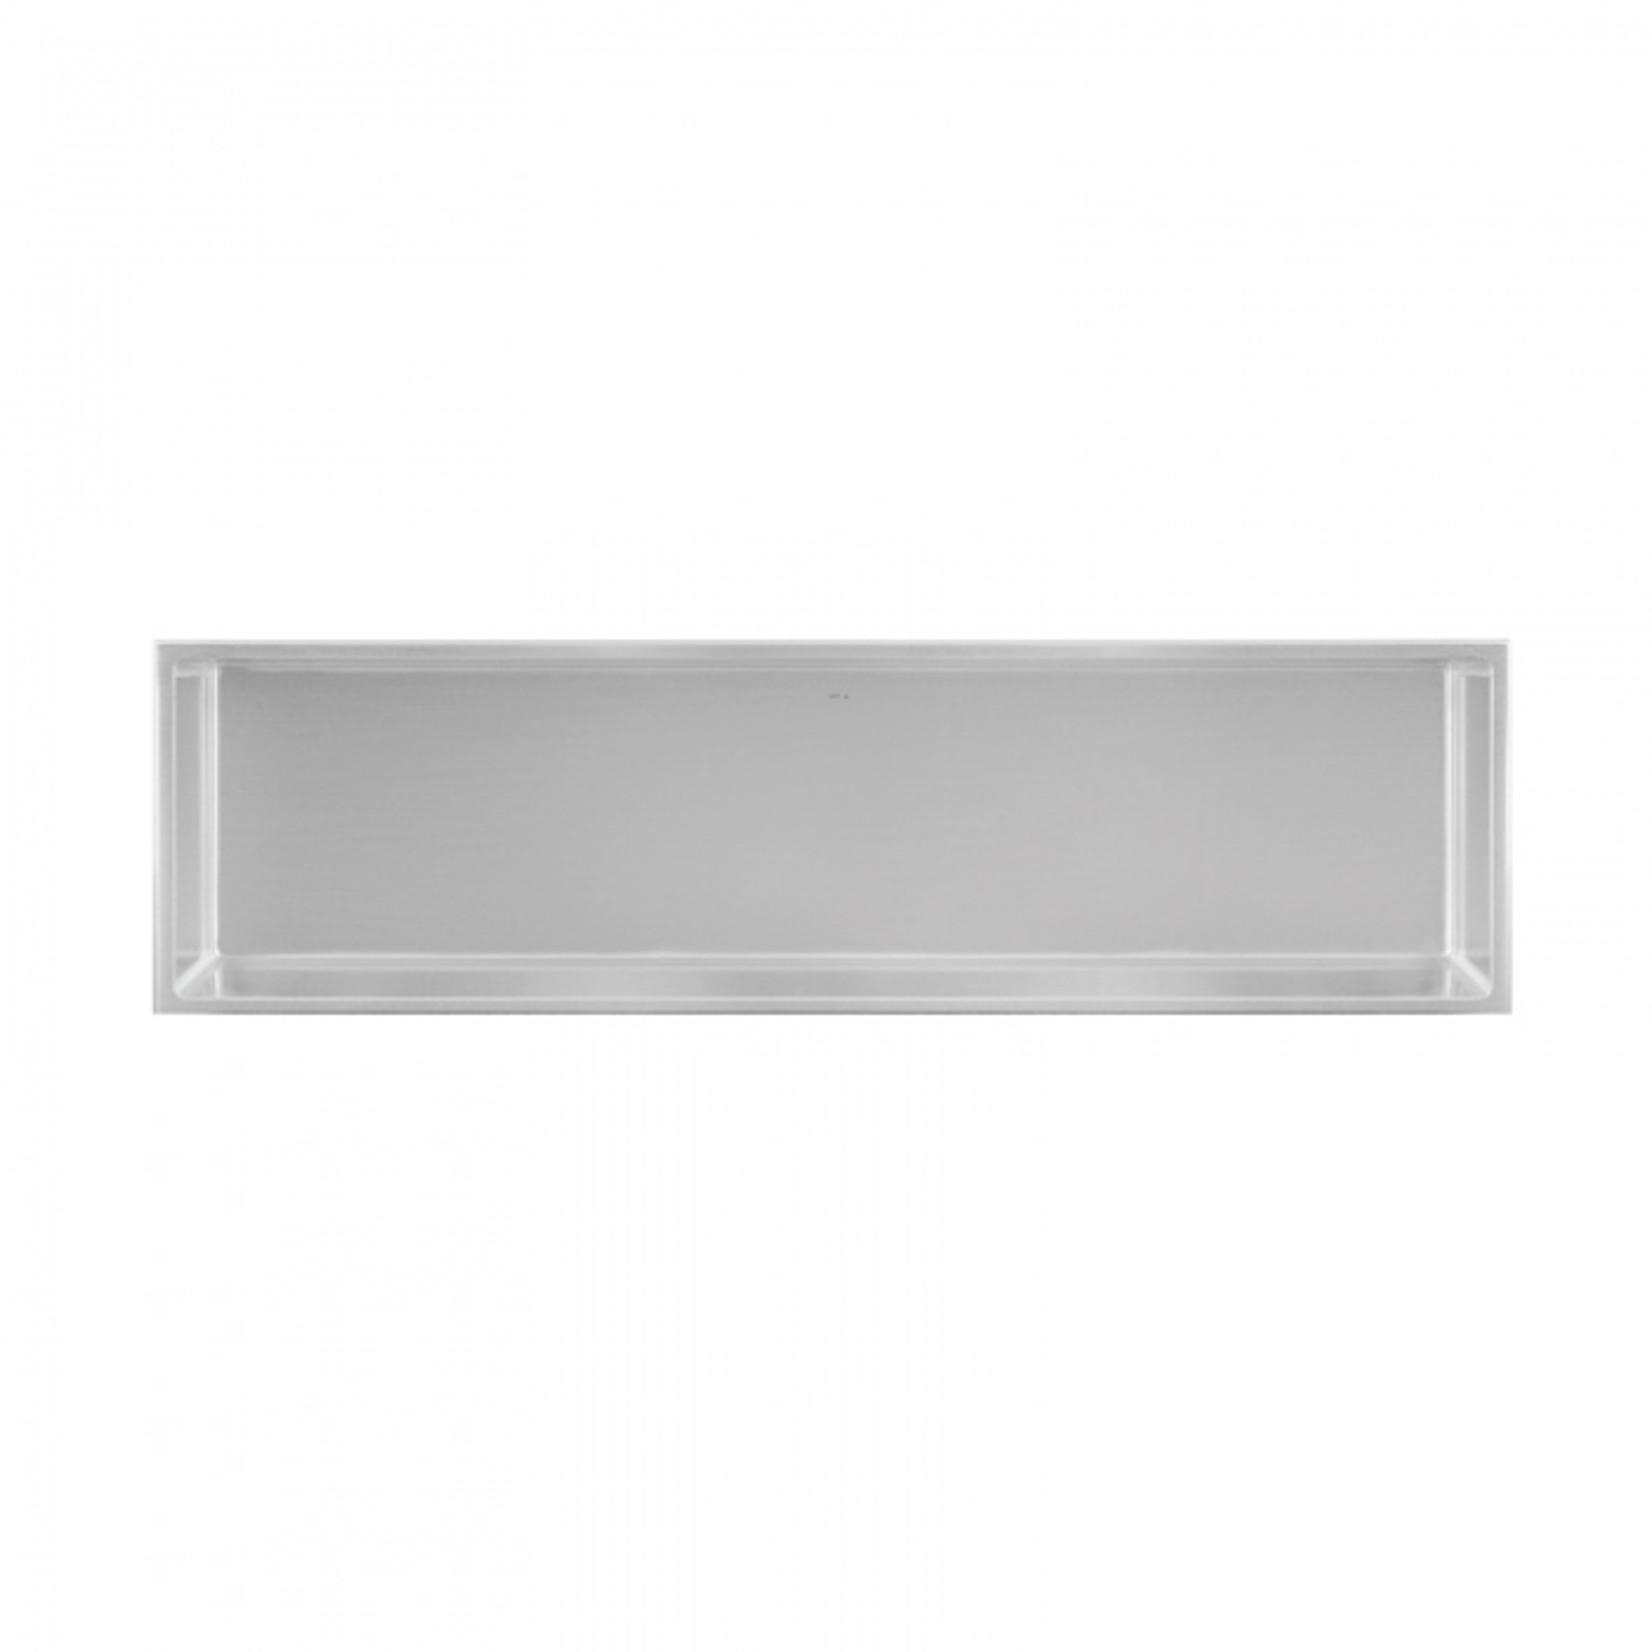 Wall niche 12x48 Stainless steel Nautika NI1248